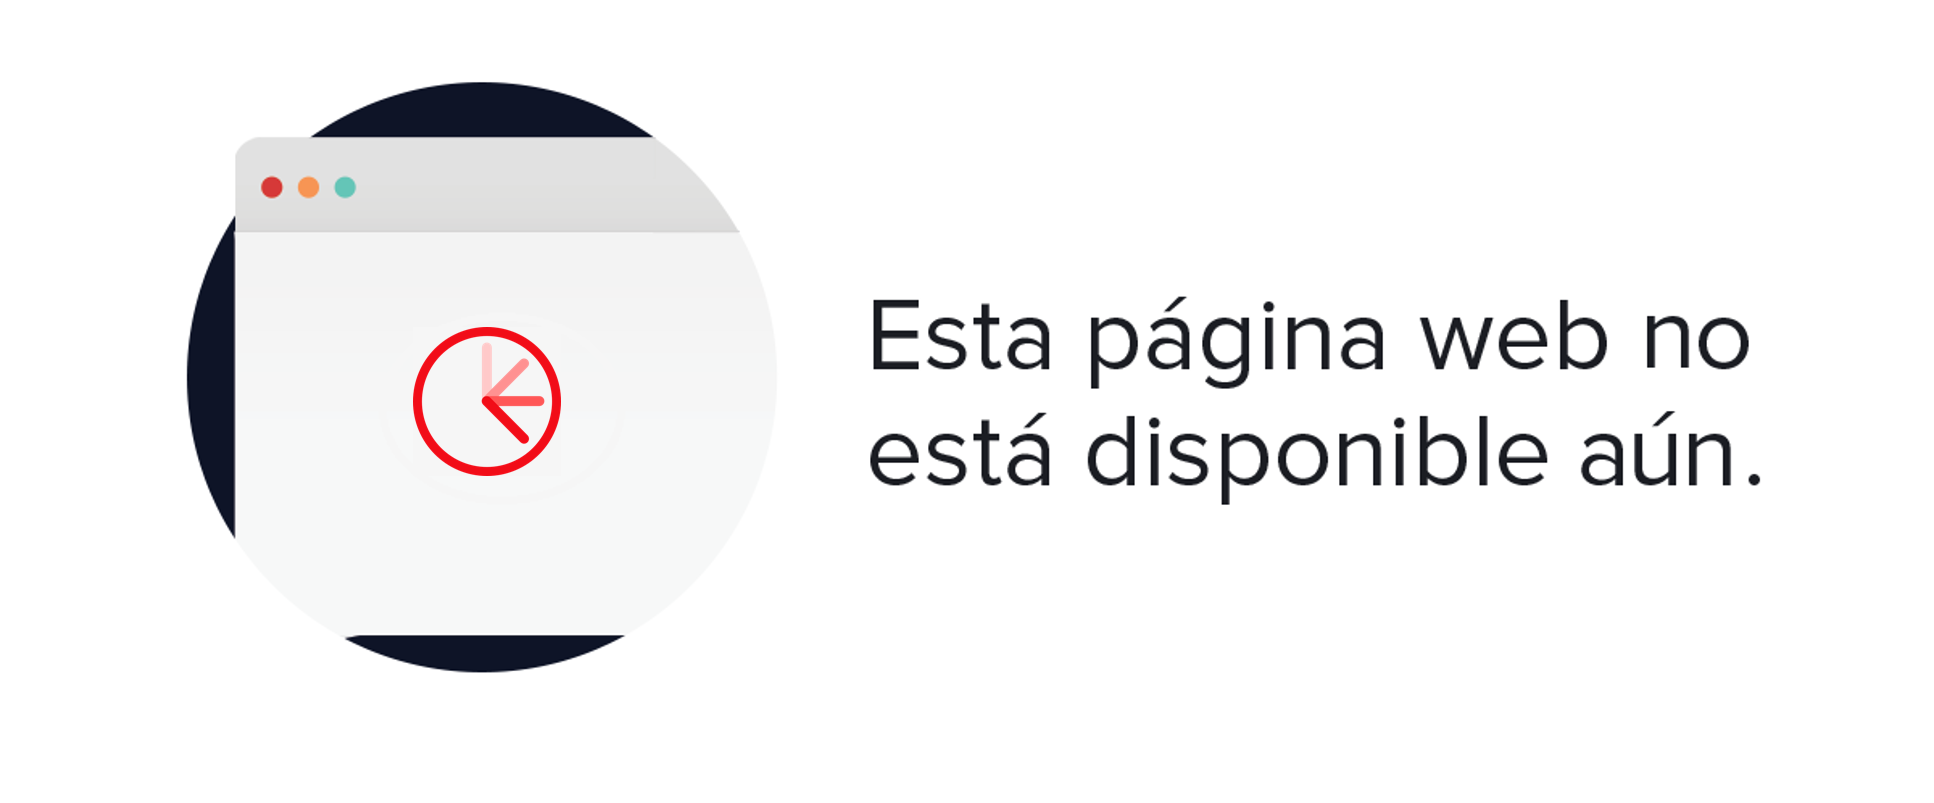 Salsa - Falda de mujer Salsa push up en denim claro Azul 5609807134915 - WDJMMKT